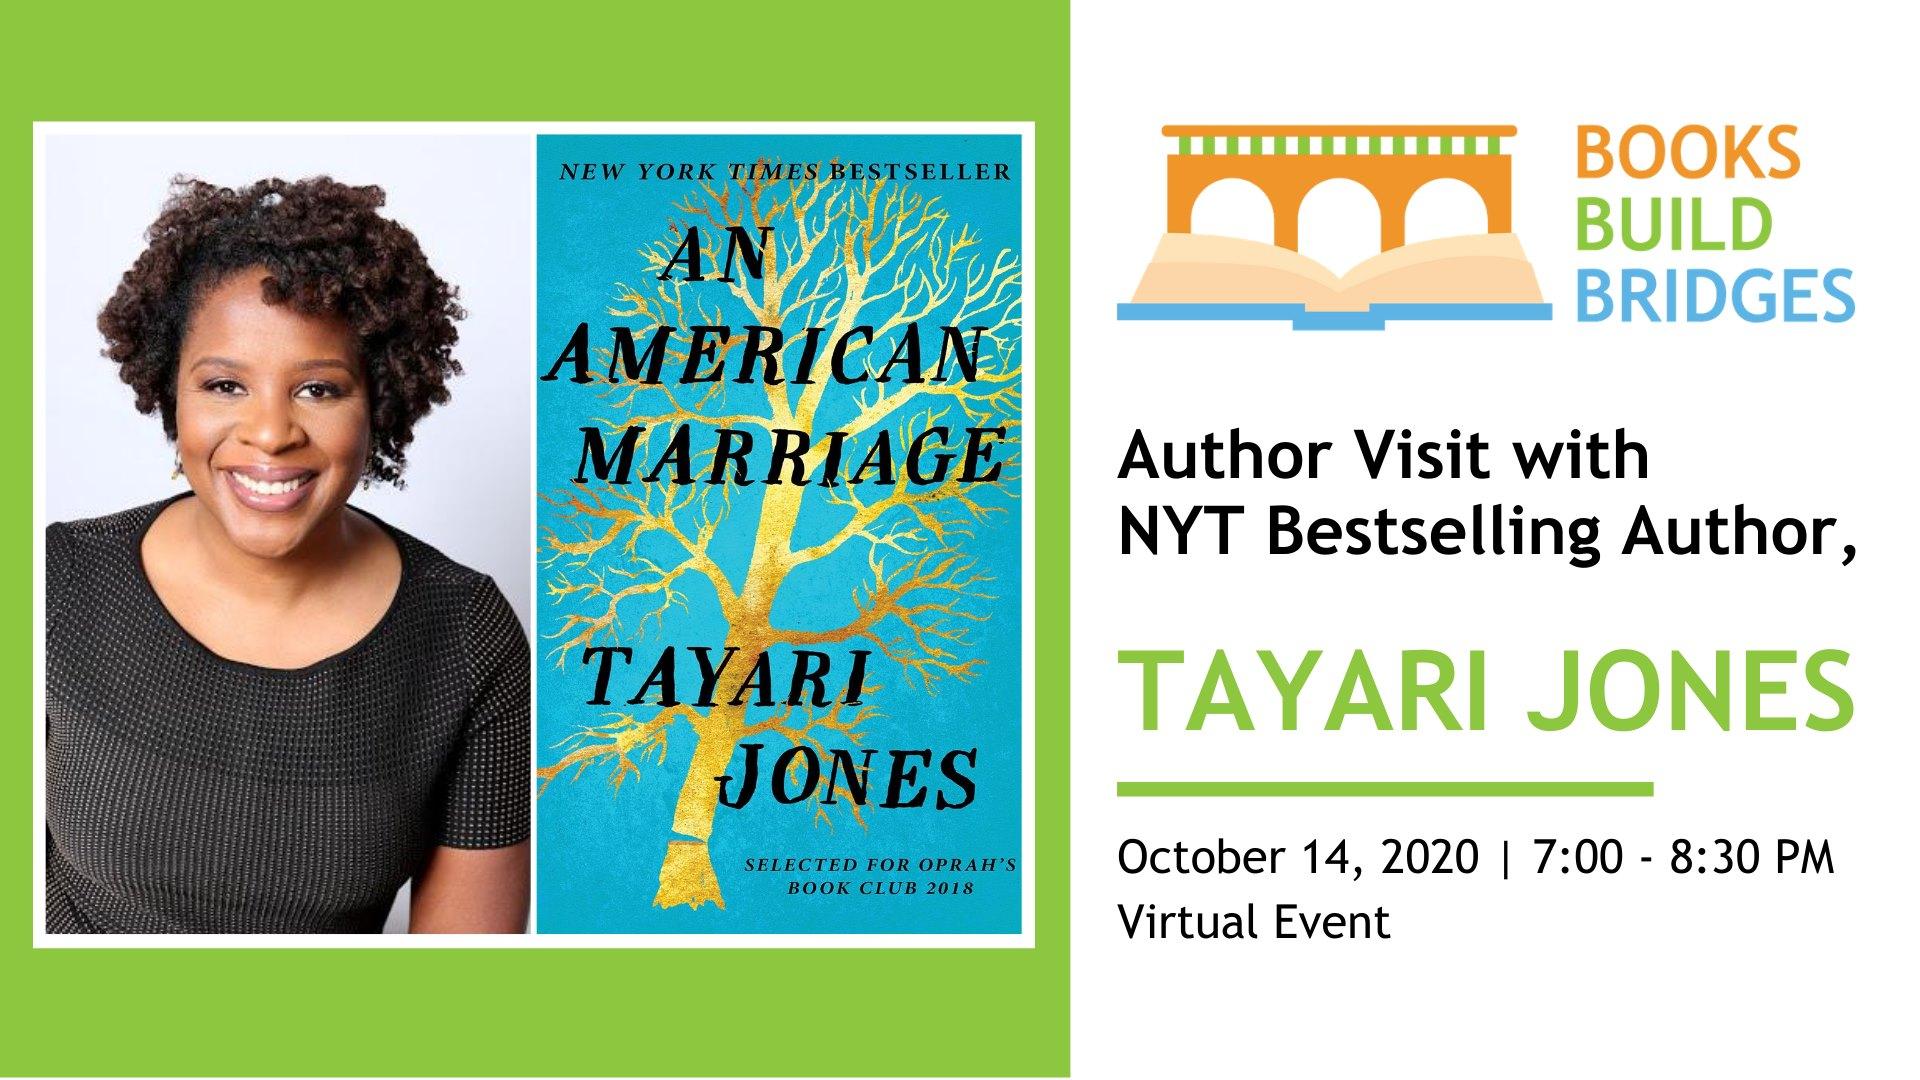 tayari jones author visit